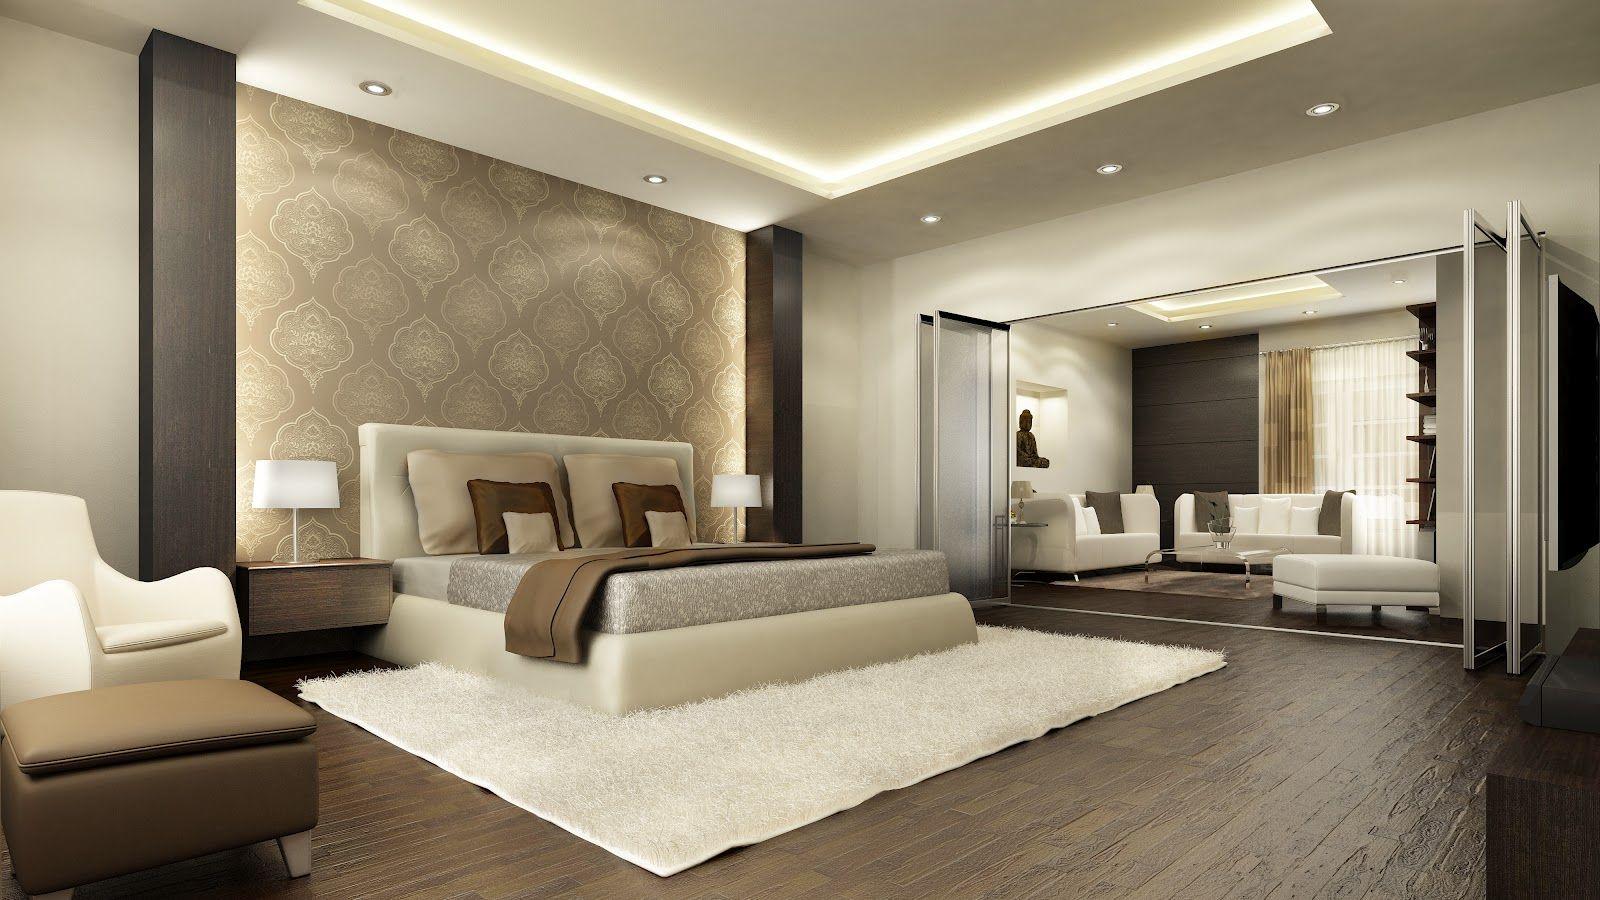 interior decoration of bedroom.  Interior Modern Bed Wall Interior Designs  Google Search In Interior Decoration Of Bedroom